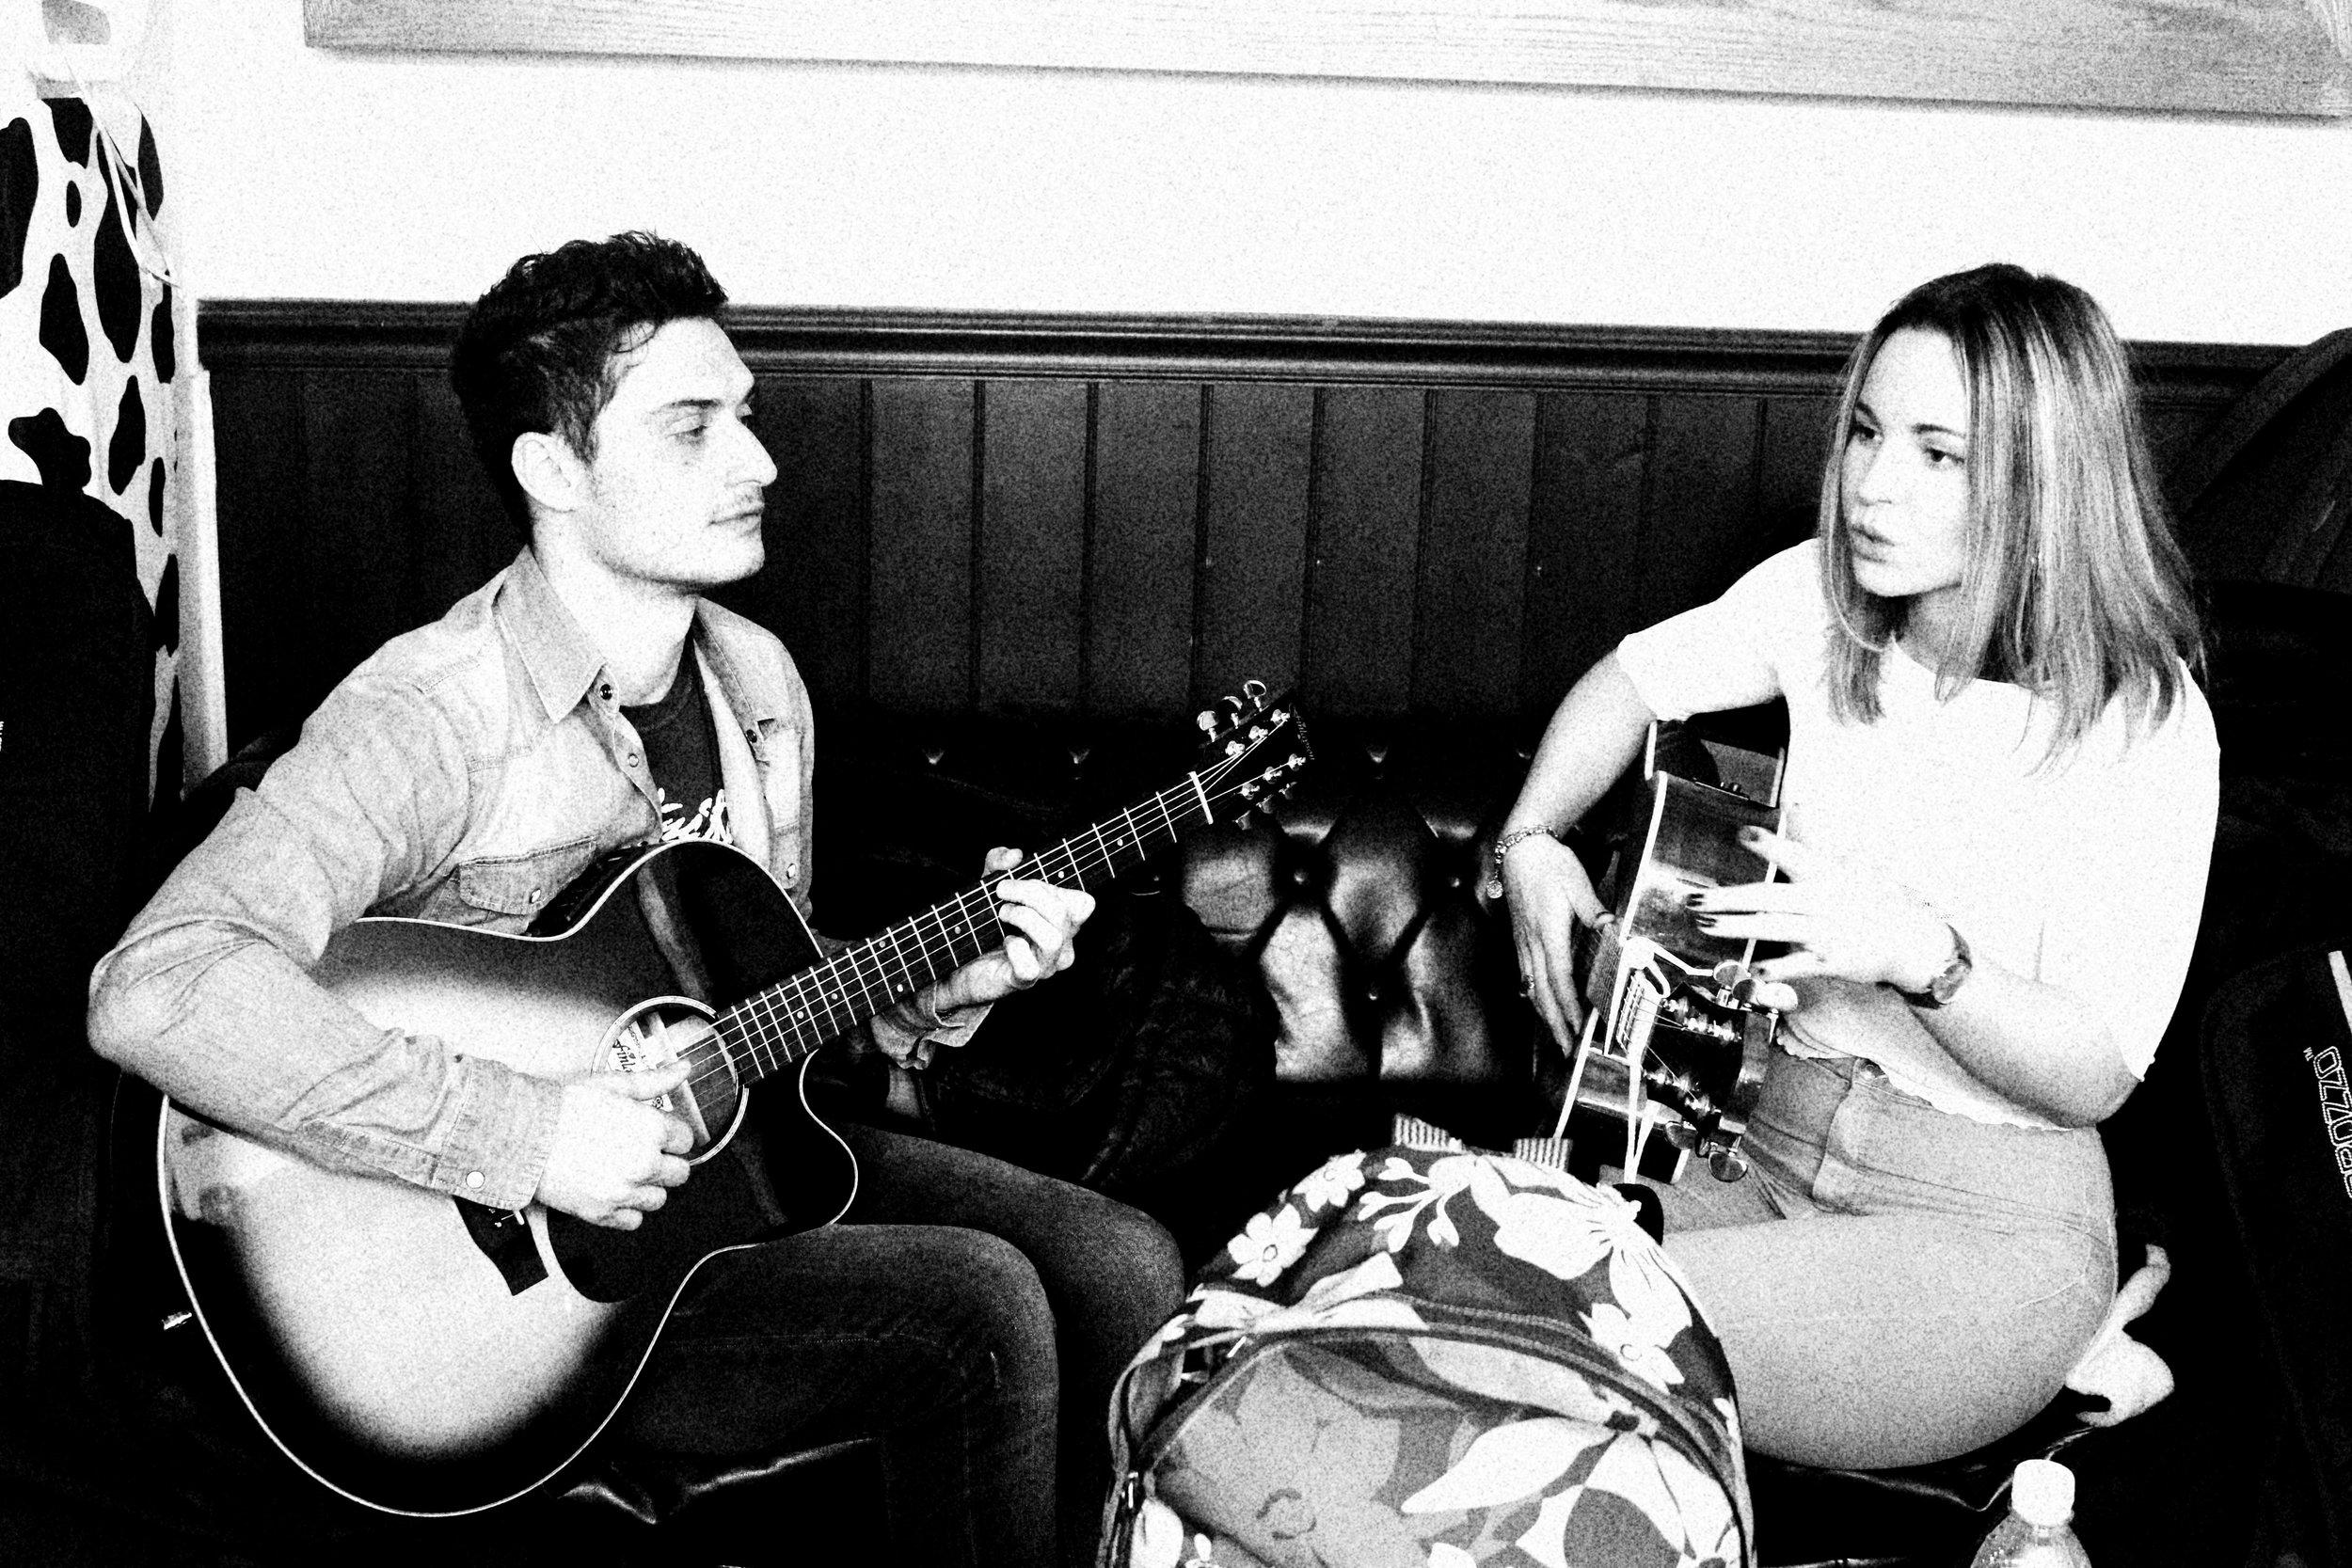 duo singer guitarist female camden.jpg